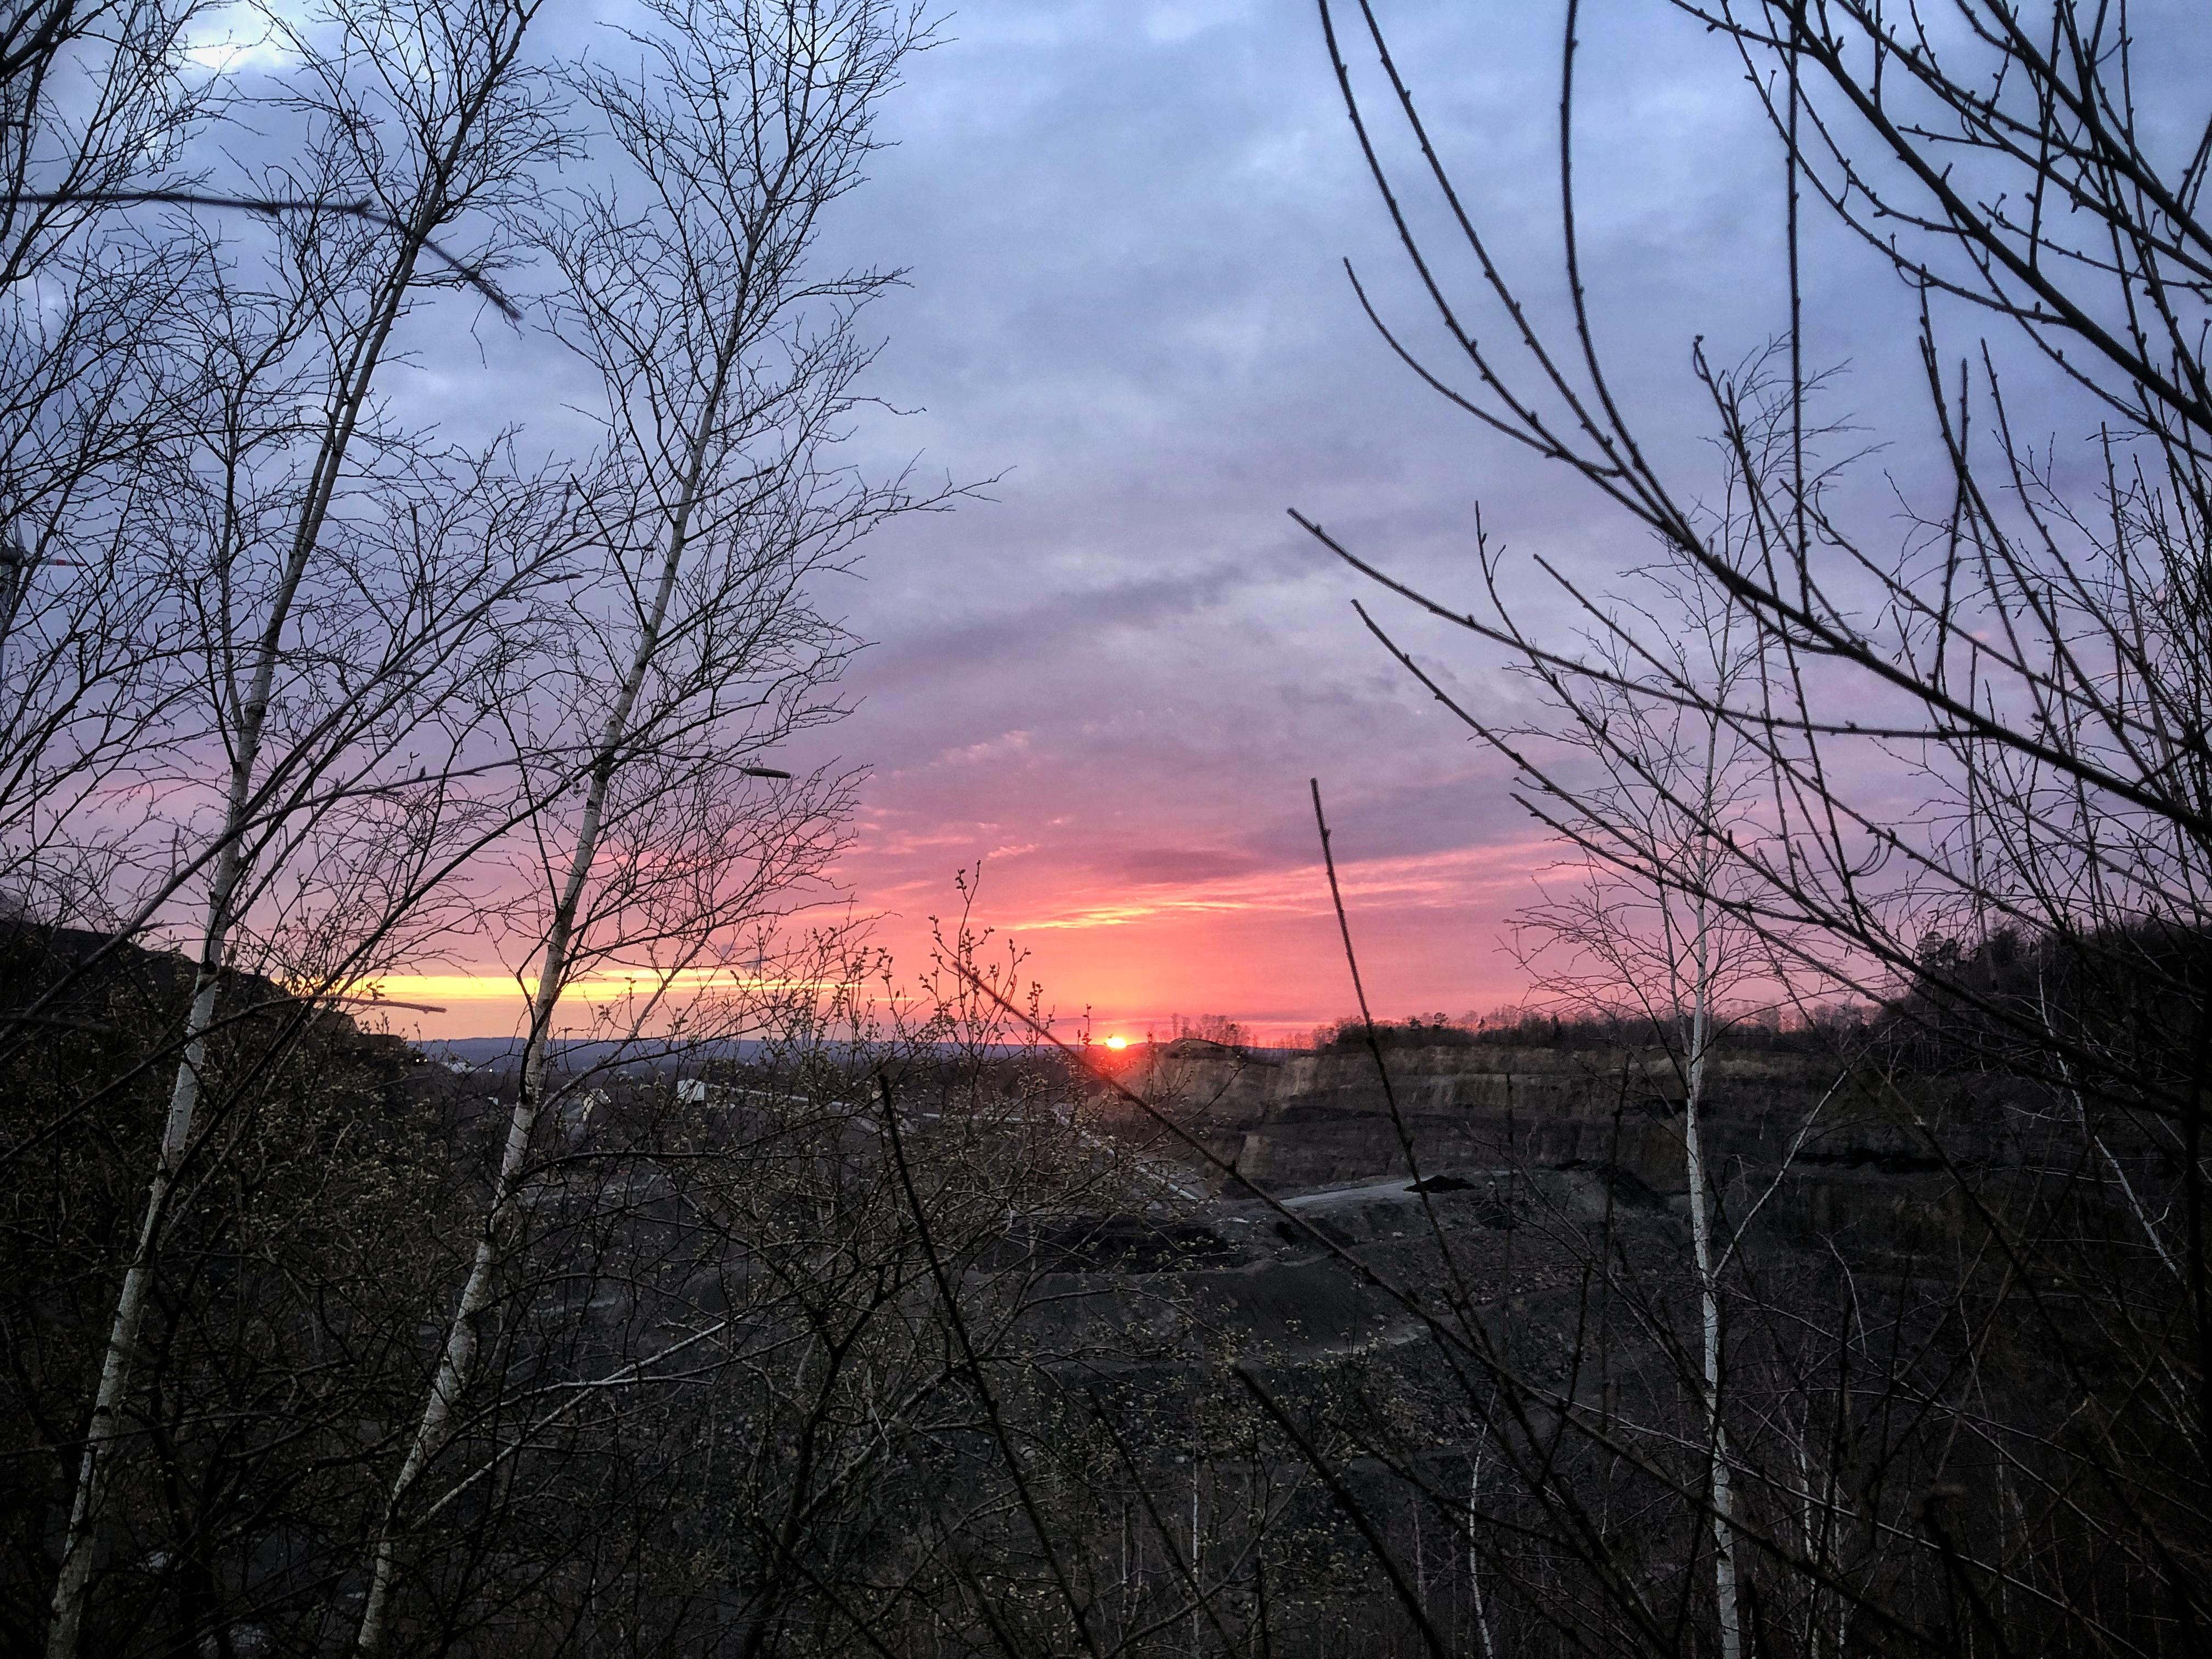 Sonnenuntergang und Corona